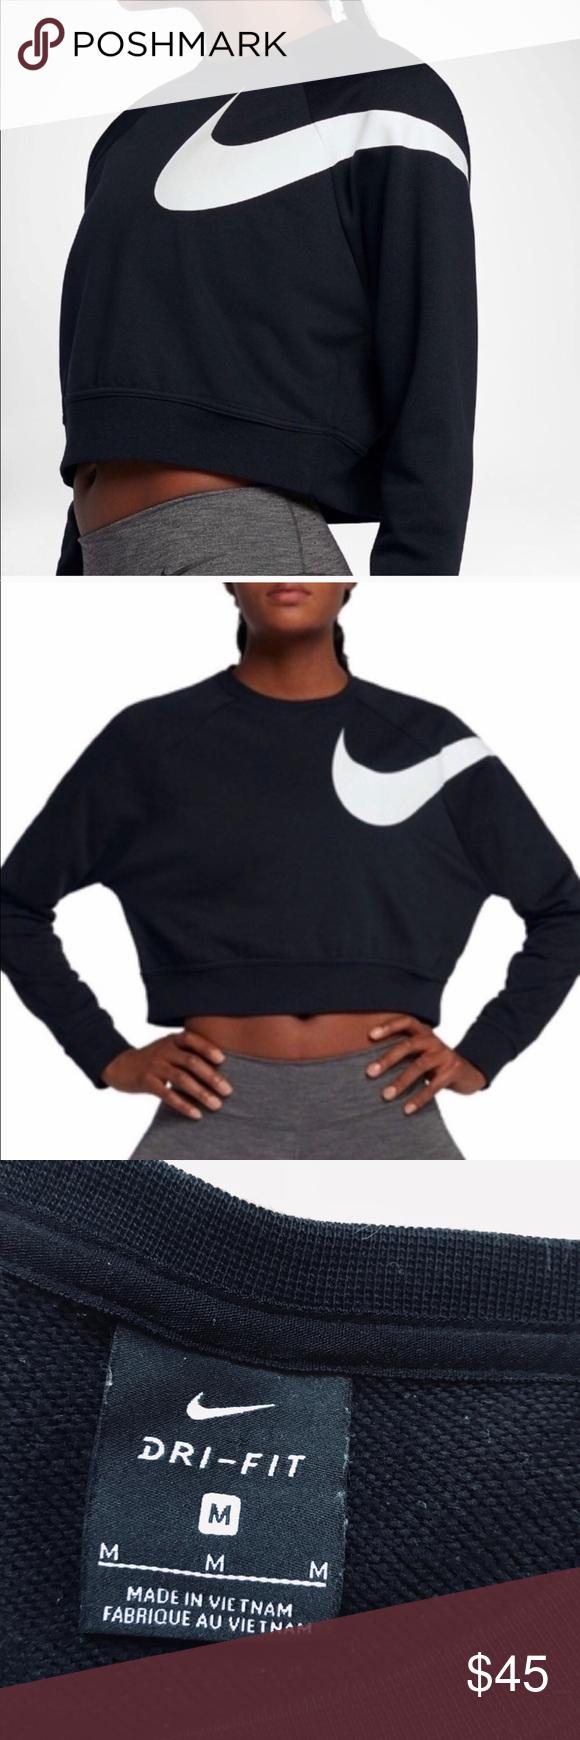 Nike Dri Fit Versa Cropped Graphic Sweatshirt Sweatshirts Graphic Sweatshirt Nike Dri Fit [ 1740 x 580 Pixel ]